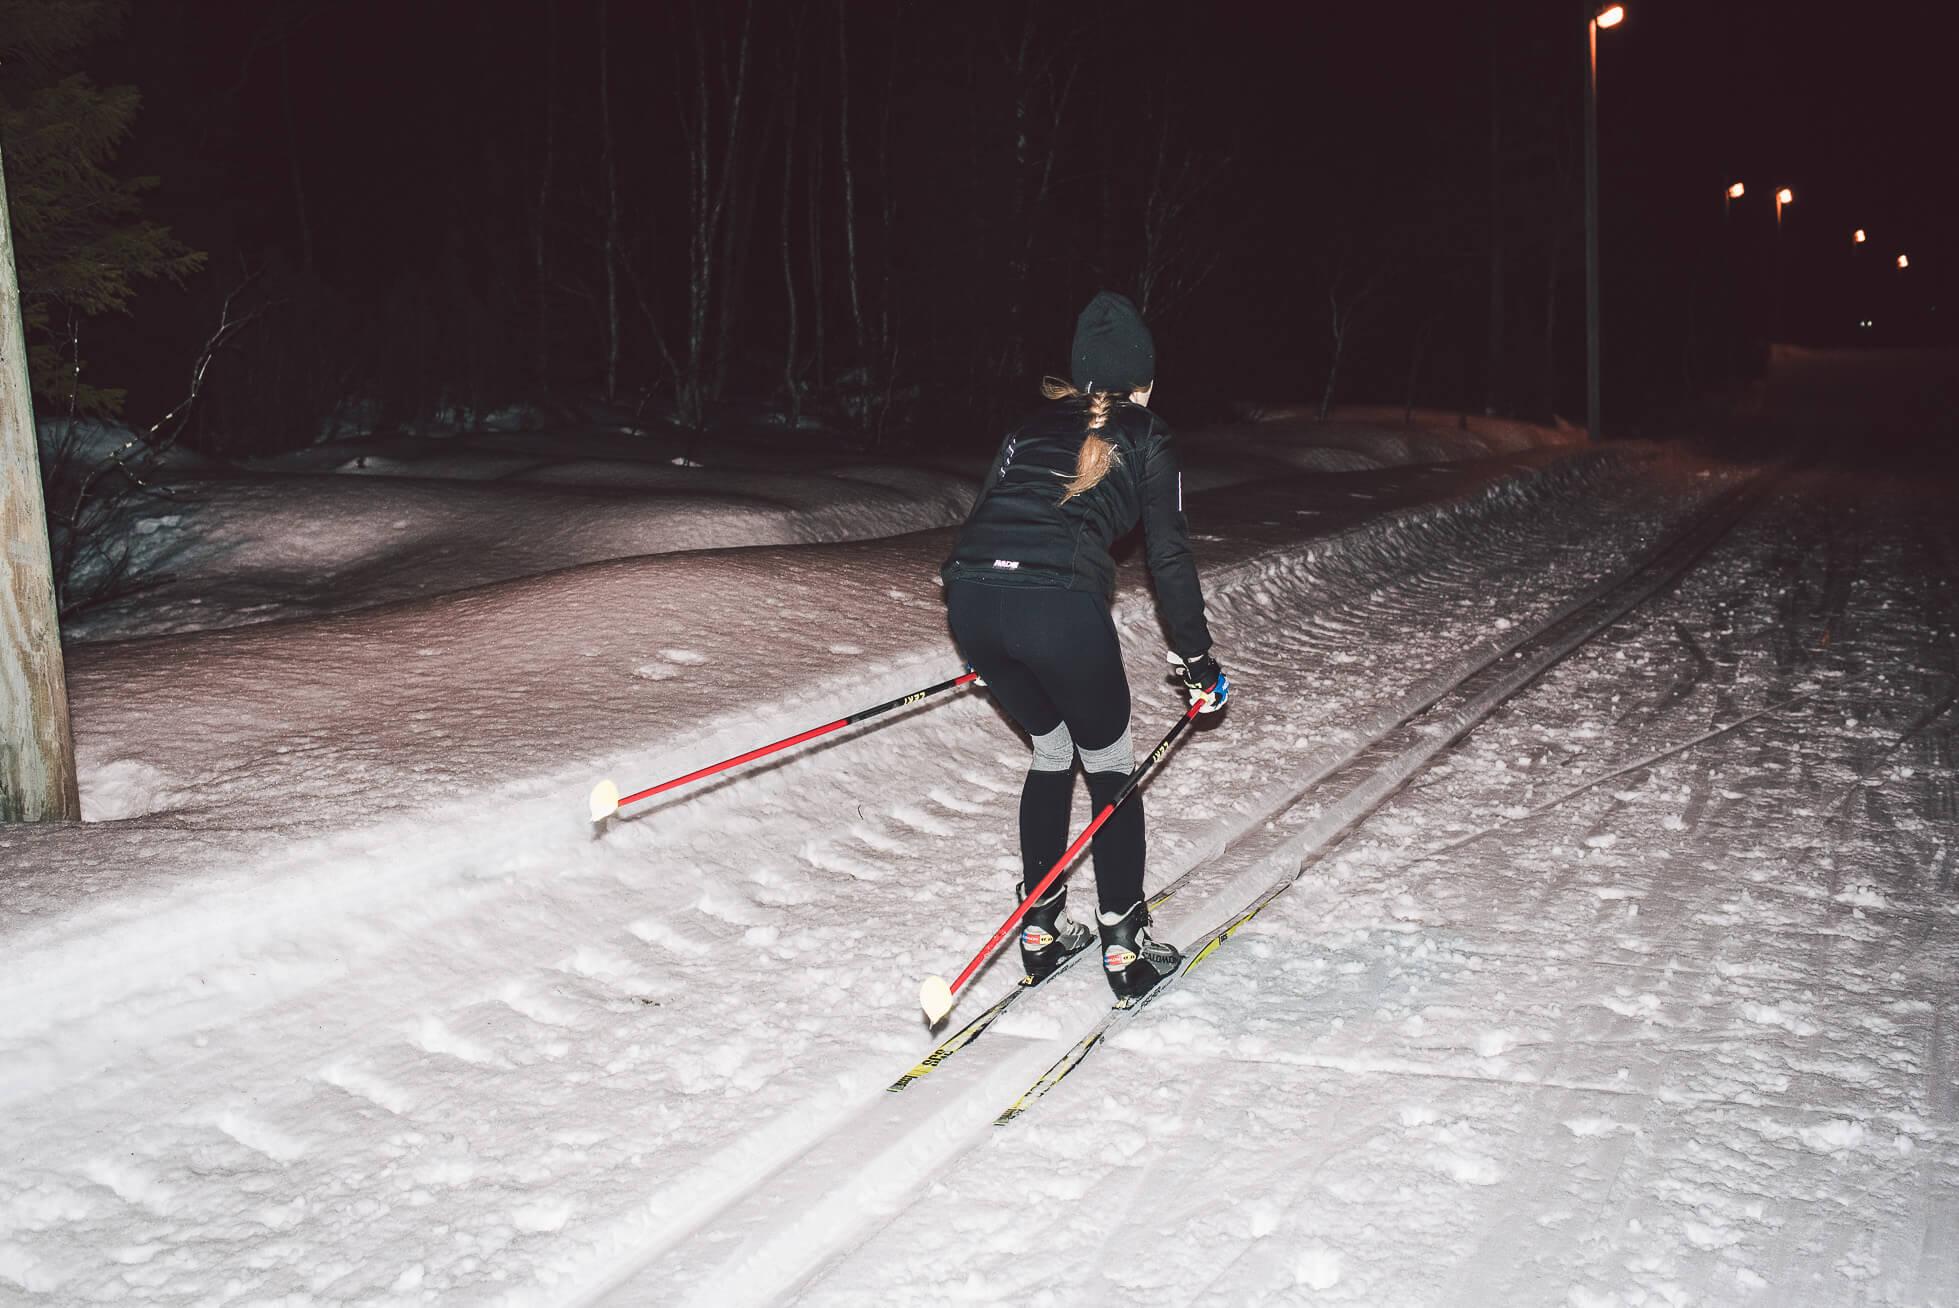 janni-deler-cross-country-skiingDSC_7887